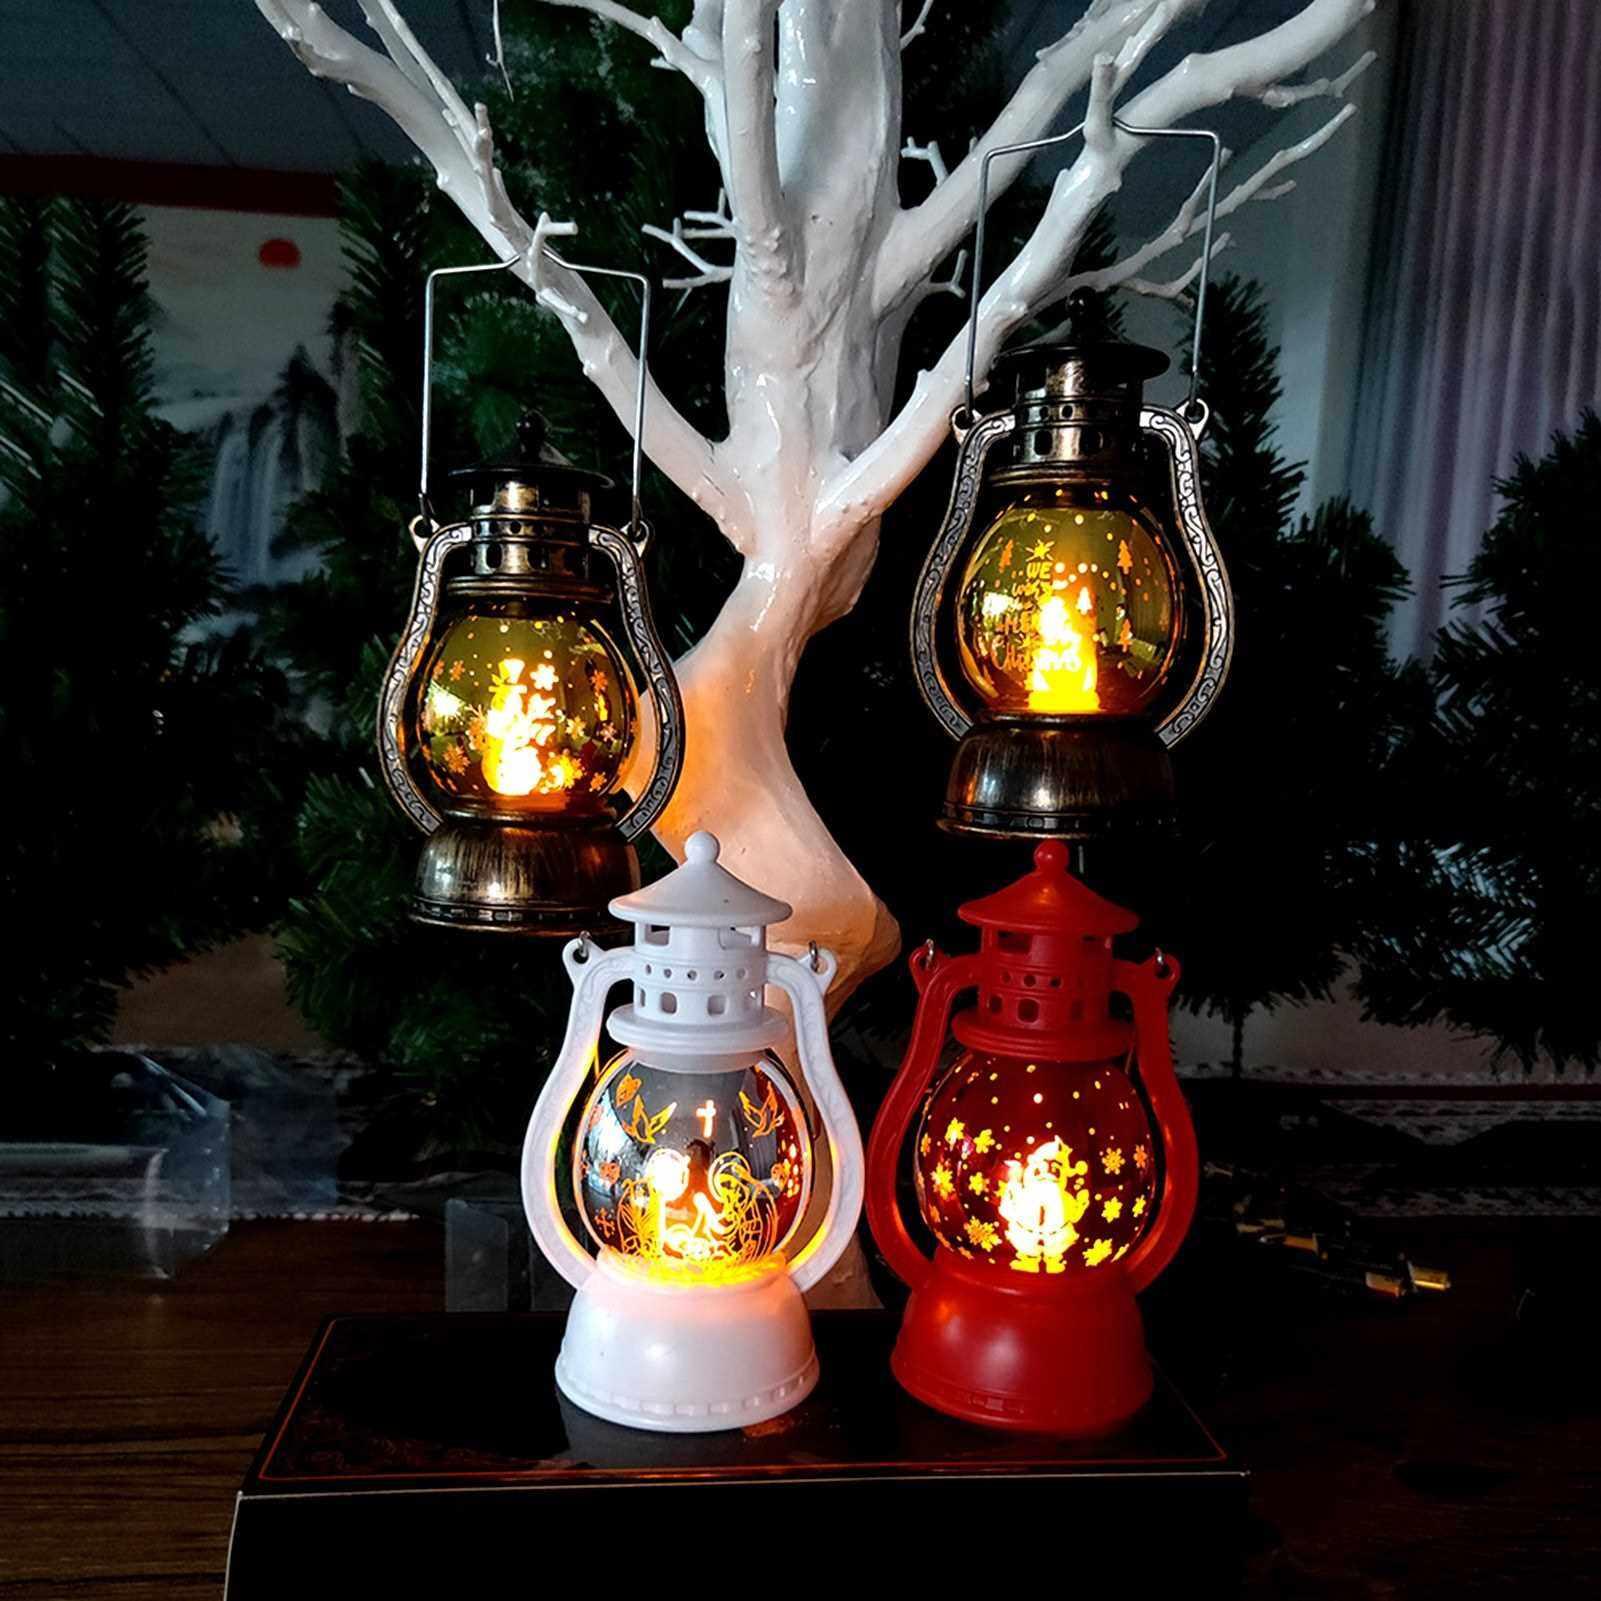 Best Selling Warm Light Storm Lantern Christmas Pattern Small Led Lamp Decoration Xmas Pendant (White)